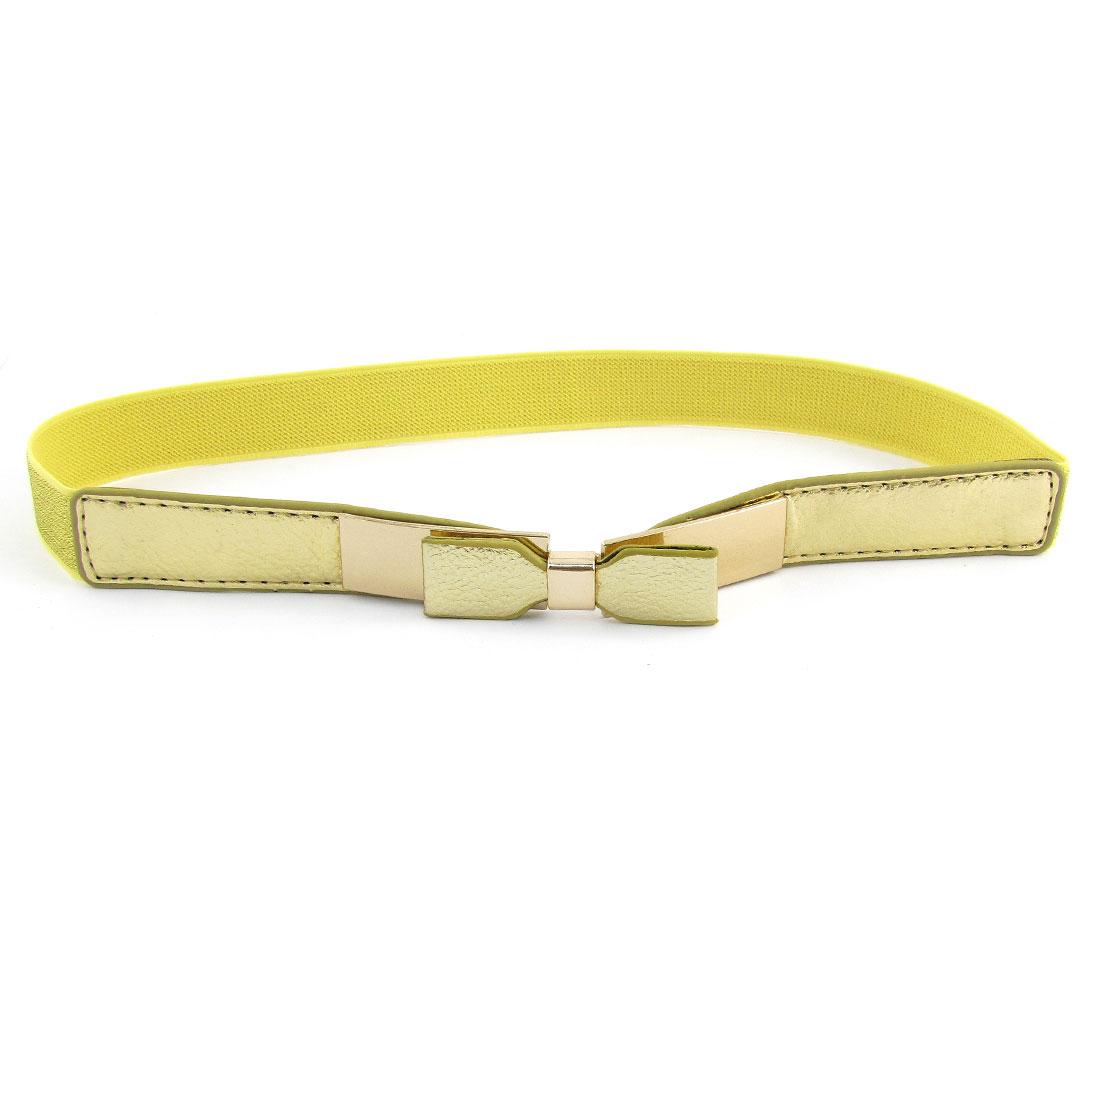 Lady Bowknot Ornament Gold Tone Metal Interlock Buckle Elastic Silm Waist Belt